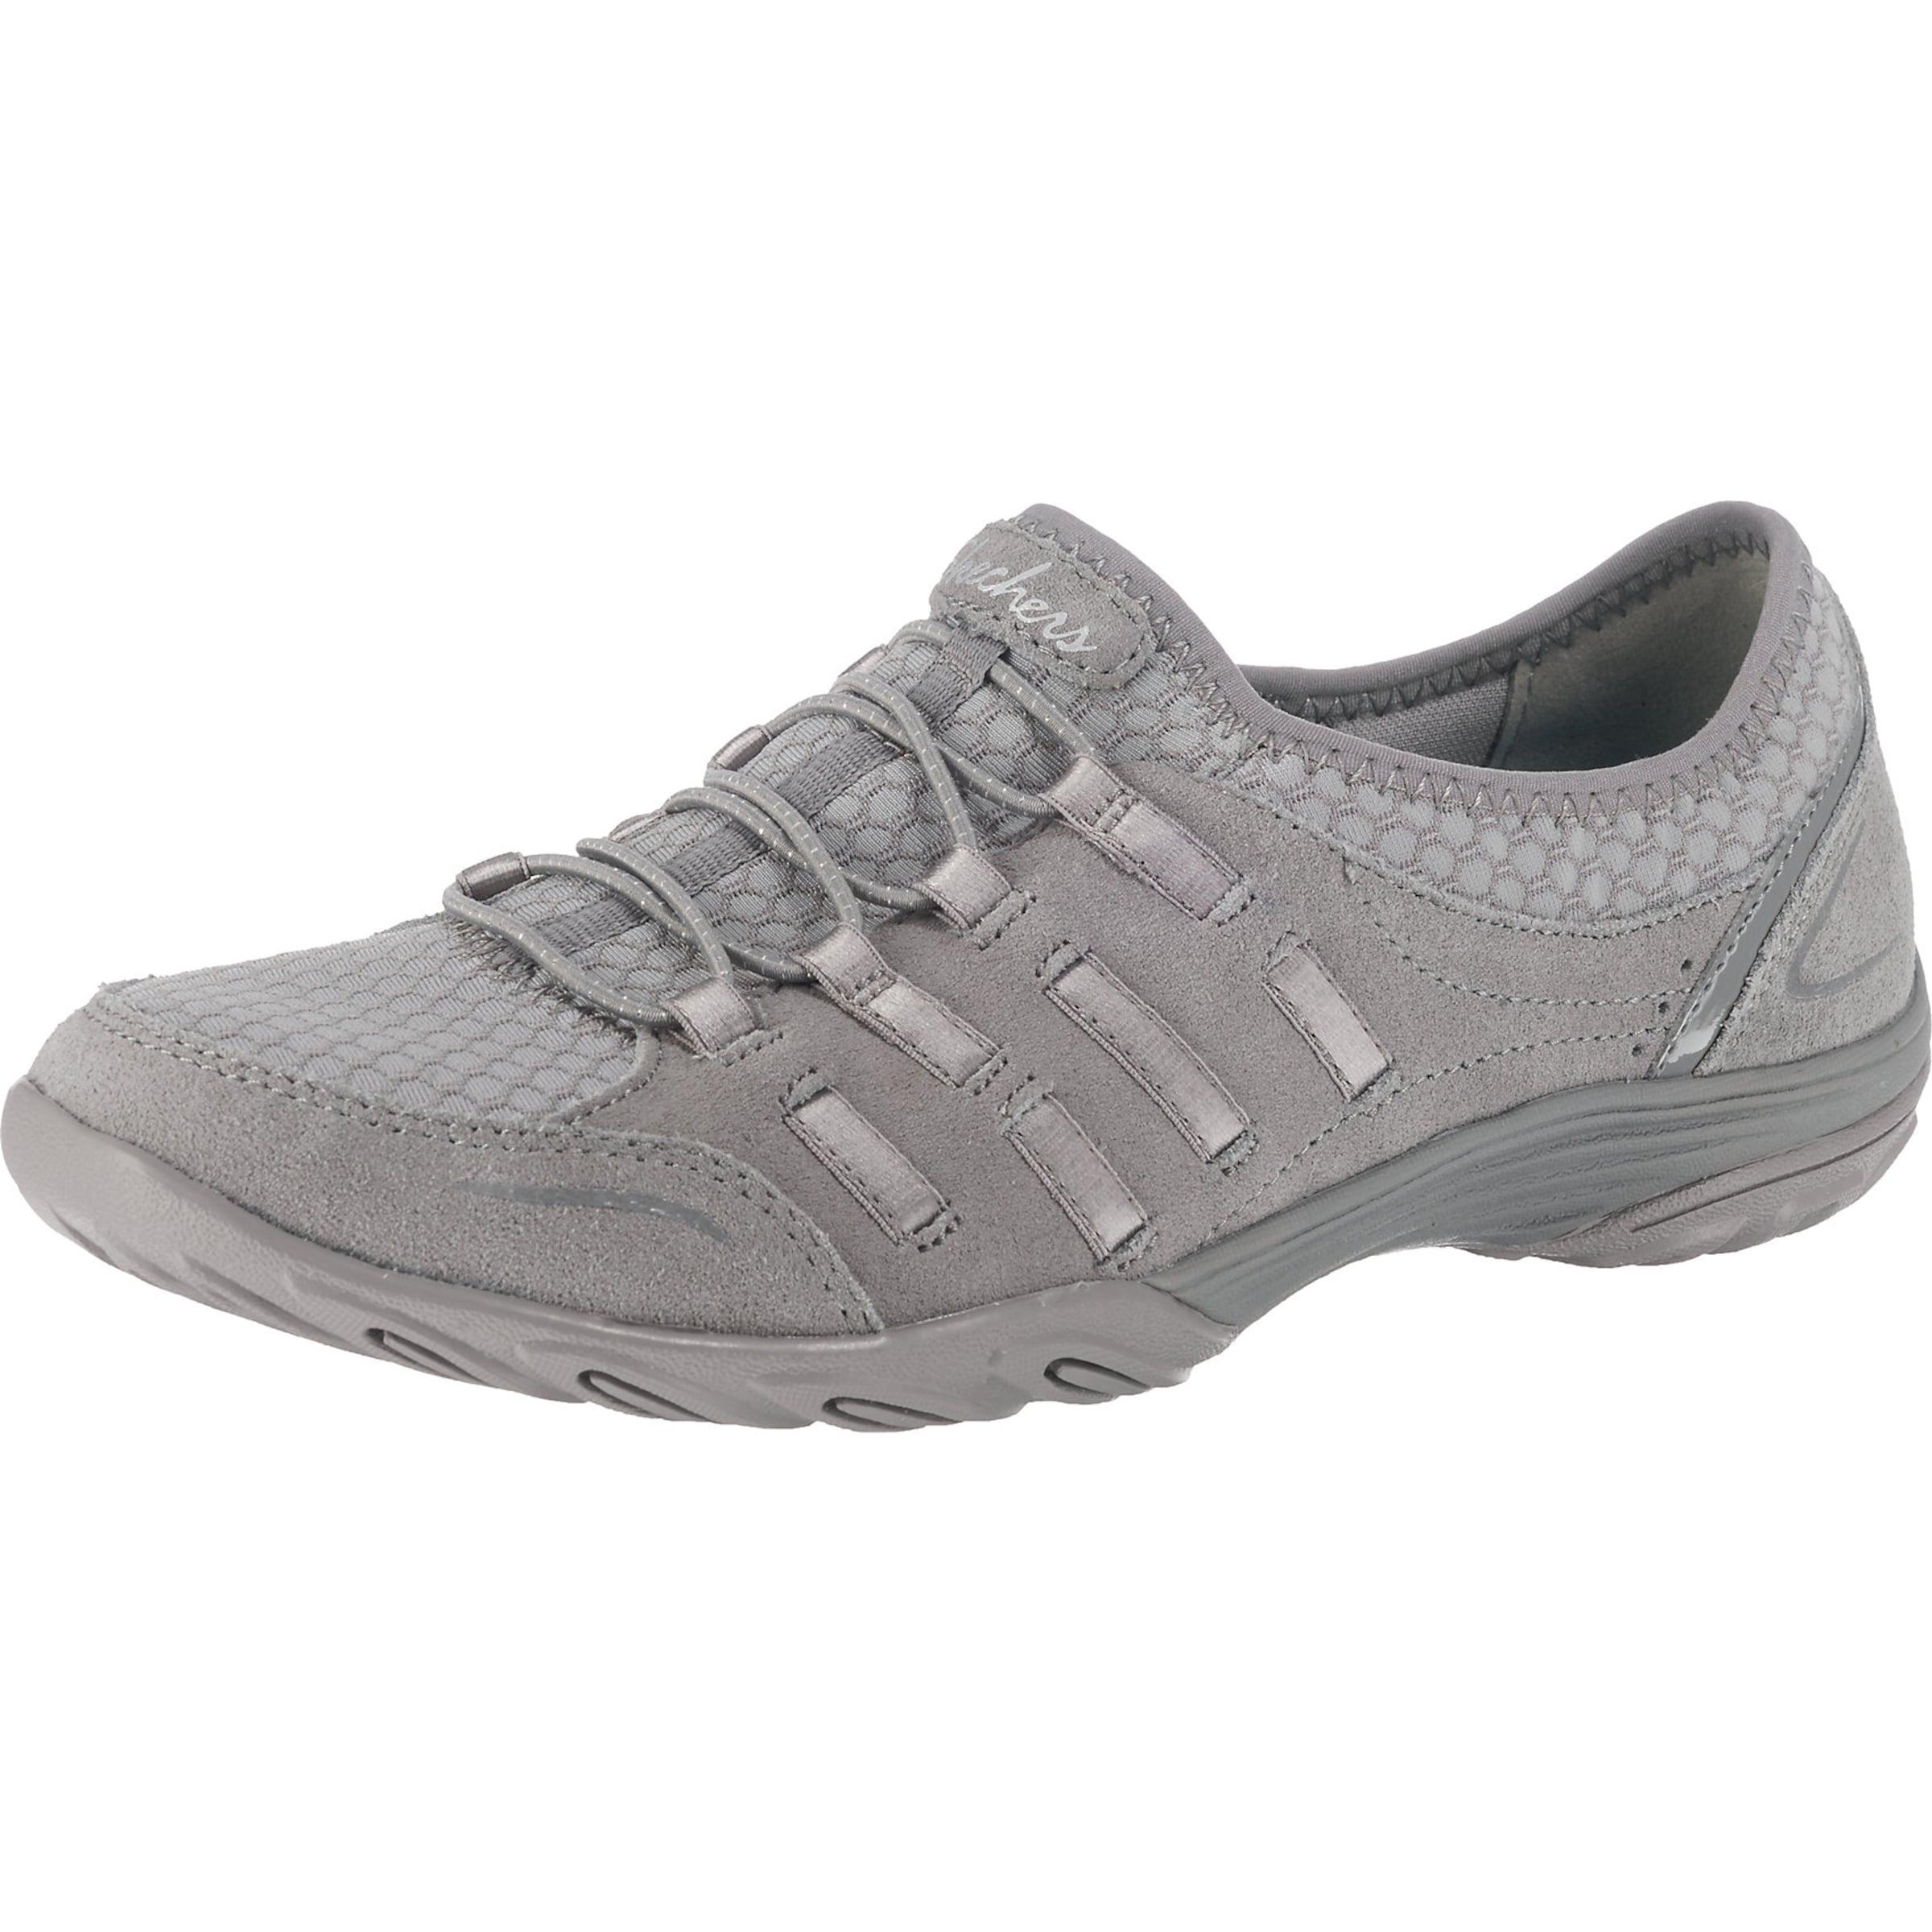 SKECHERS | 'Empress Splendid' Sportliche Slipper Schuhe Gut getragene Schuhe